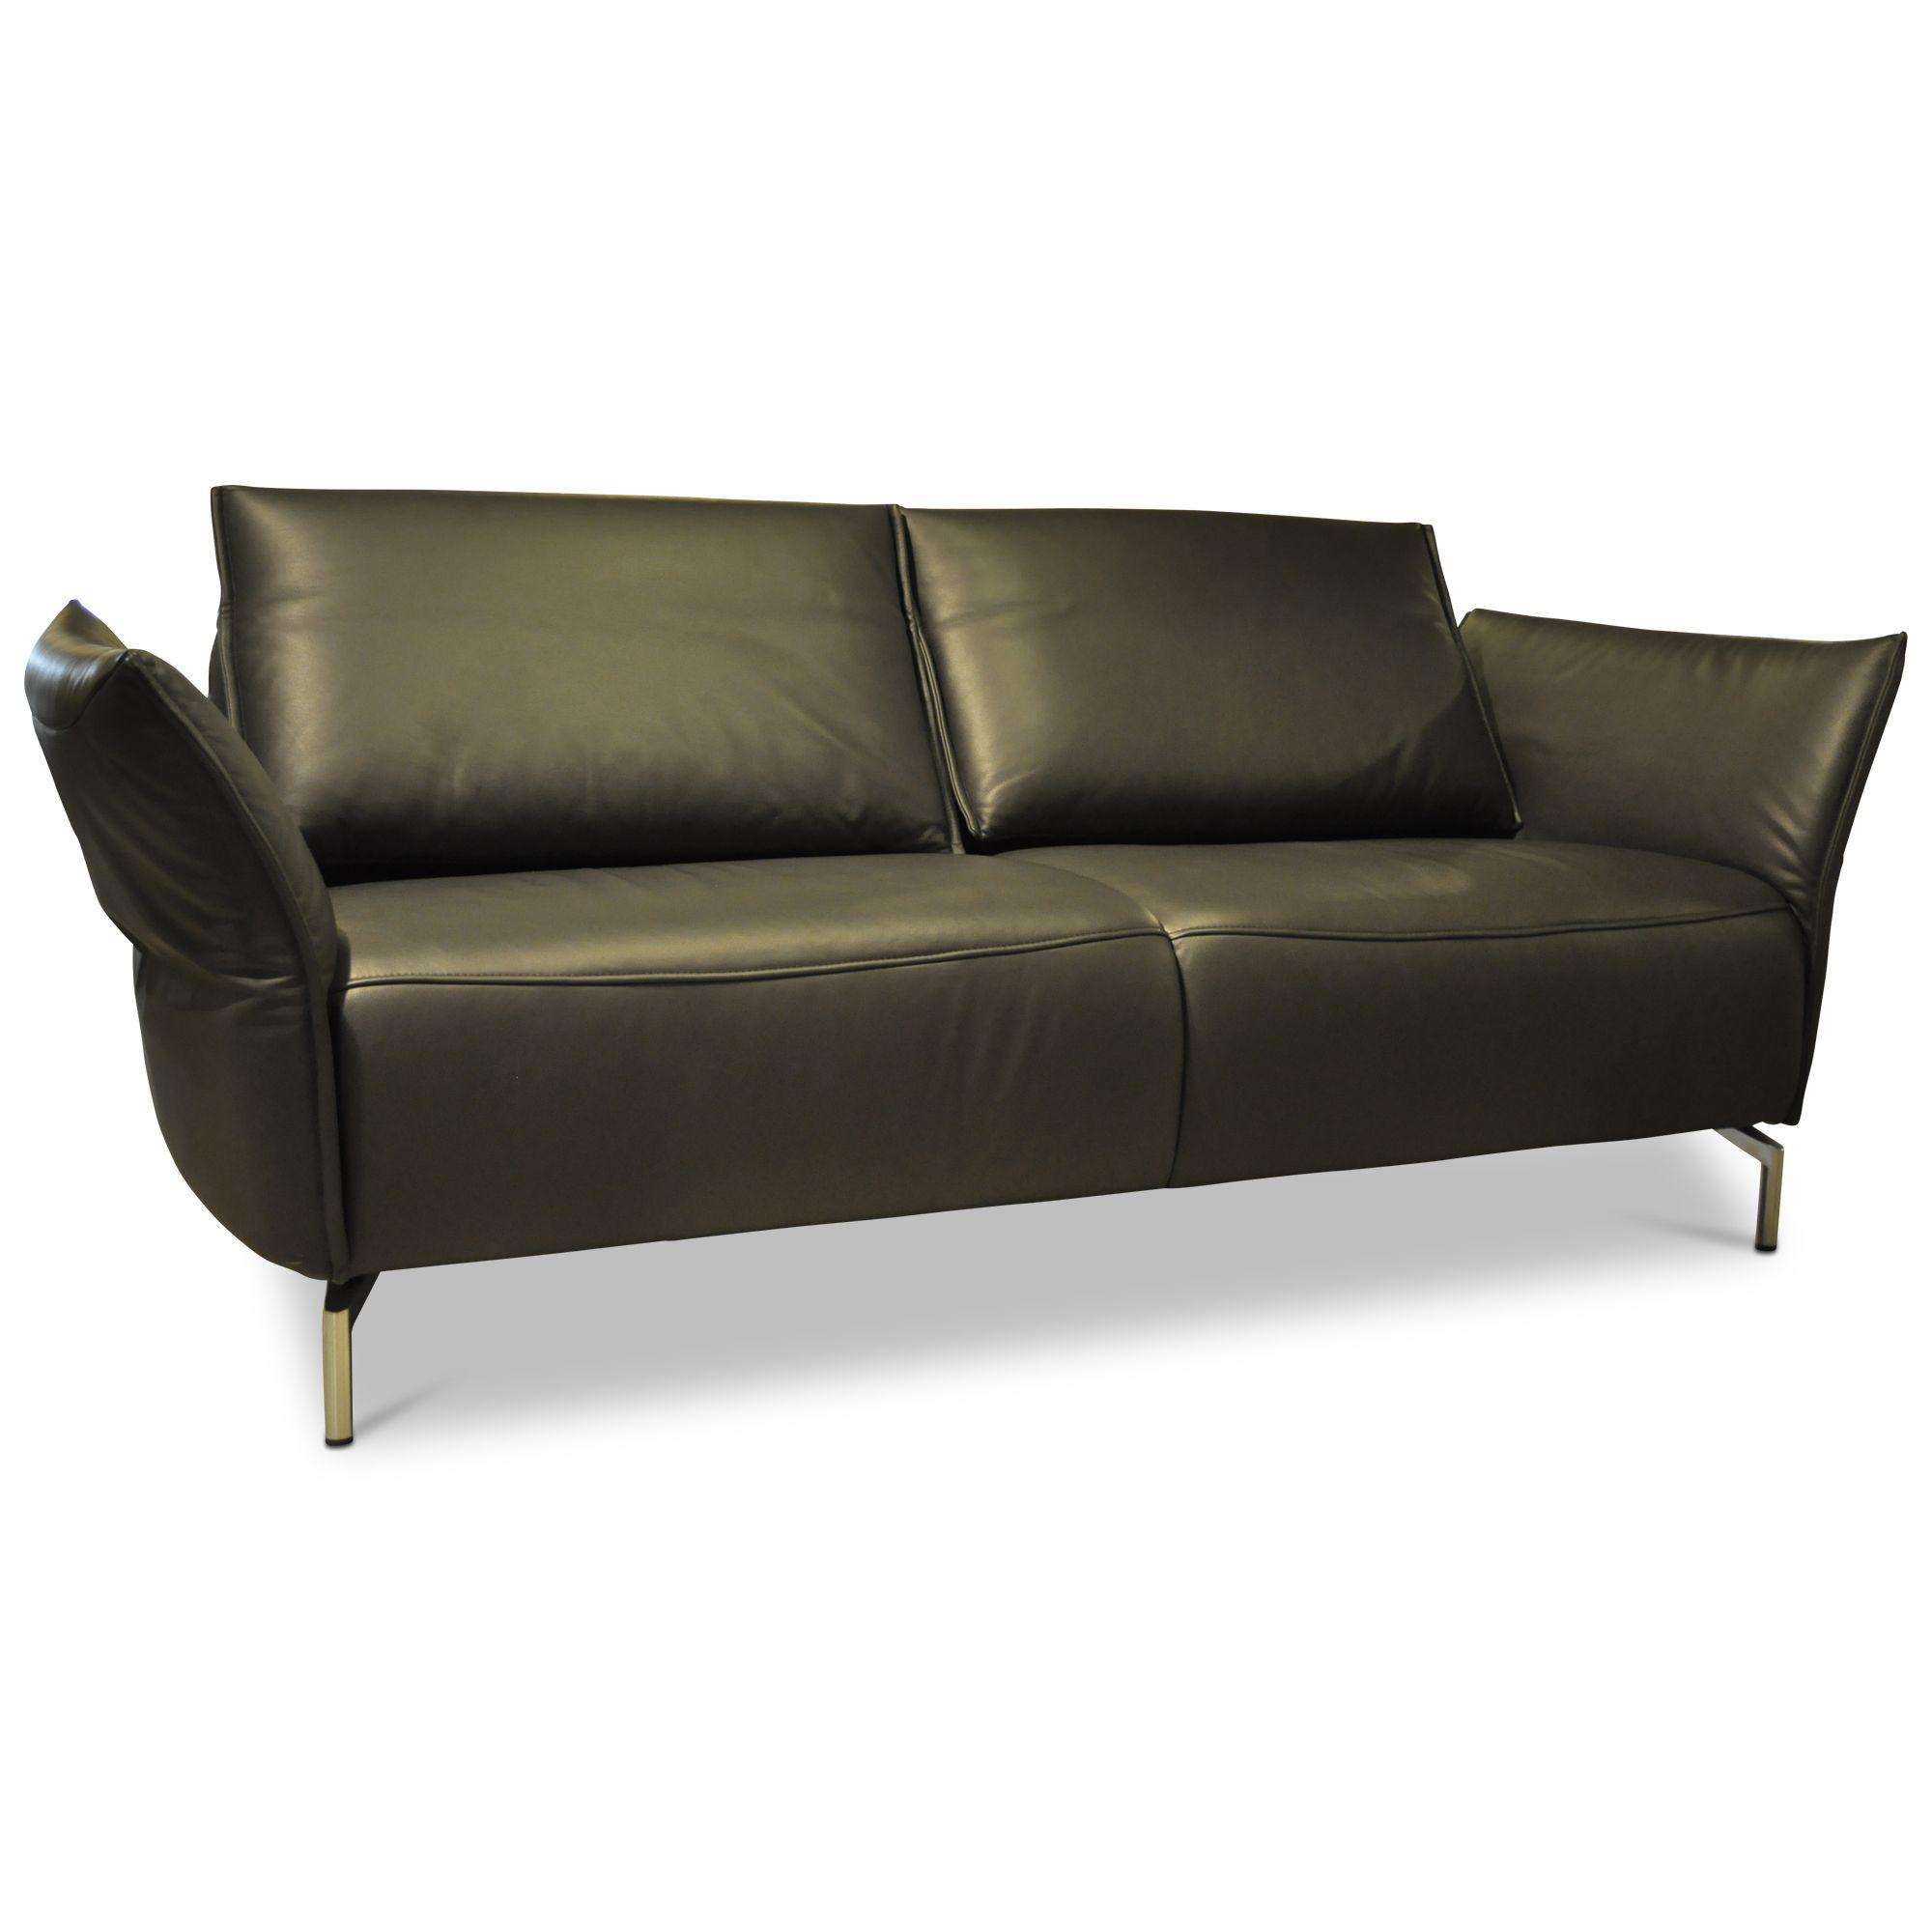 Garnitur Vanda 2 5 Sitzer 2 Sitzer Sessel Koinor Sofas